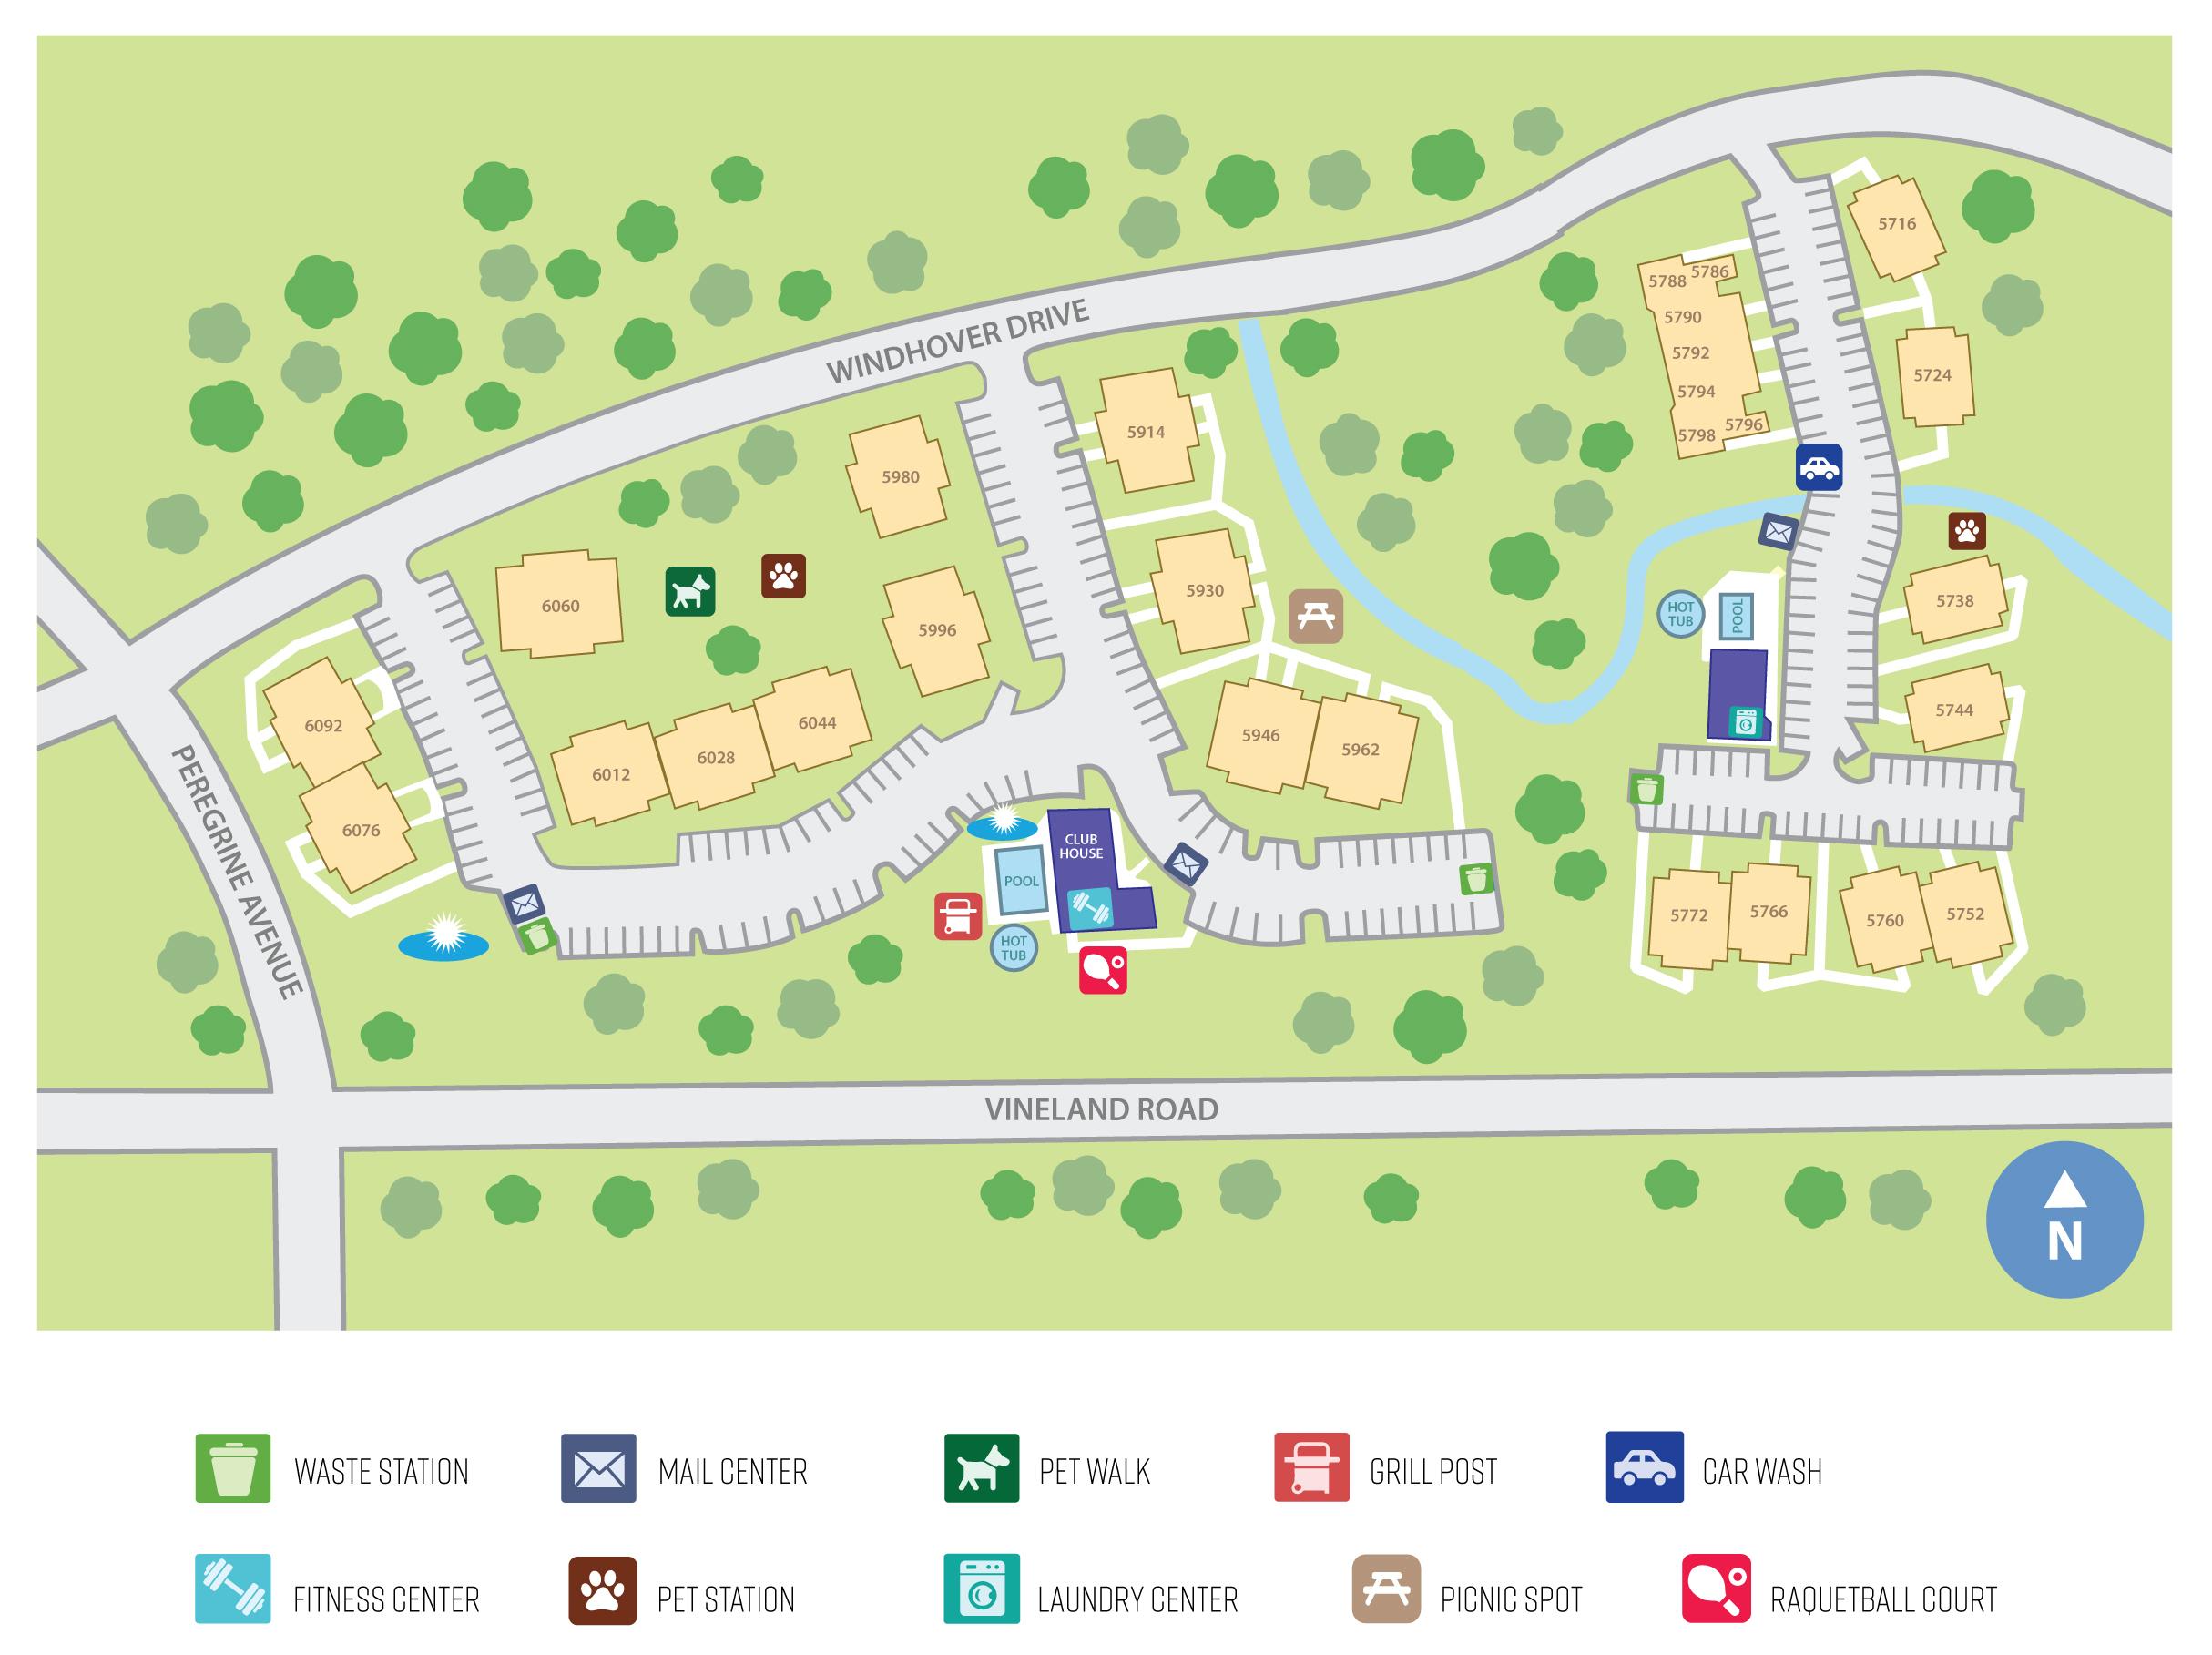 Portofino | 1-2 Bed Orlando Apts, Furnished Units Available - Portofino Florida Map